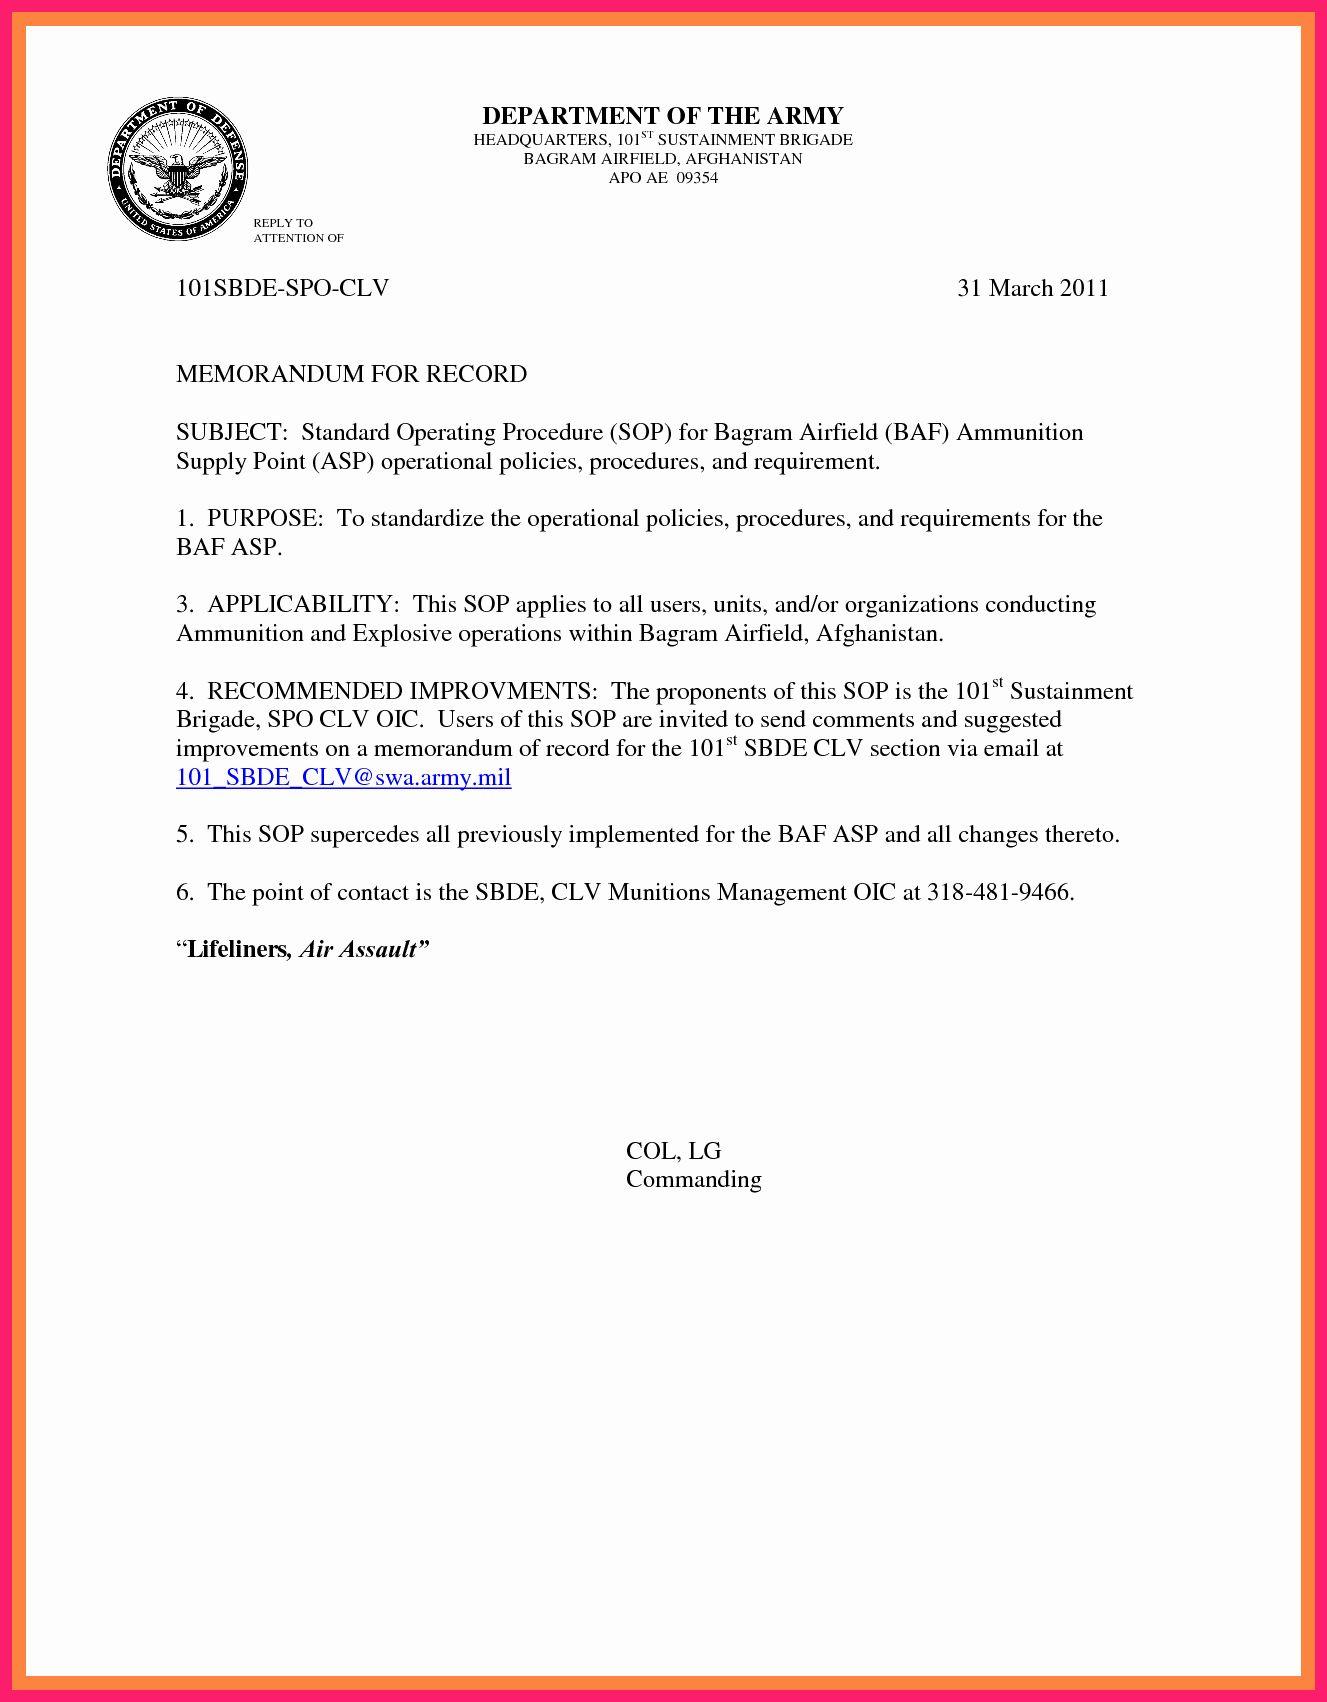 Army Memorandum for Record Template Beautiful Memorandum for